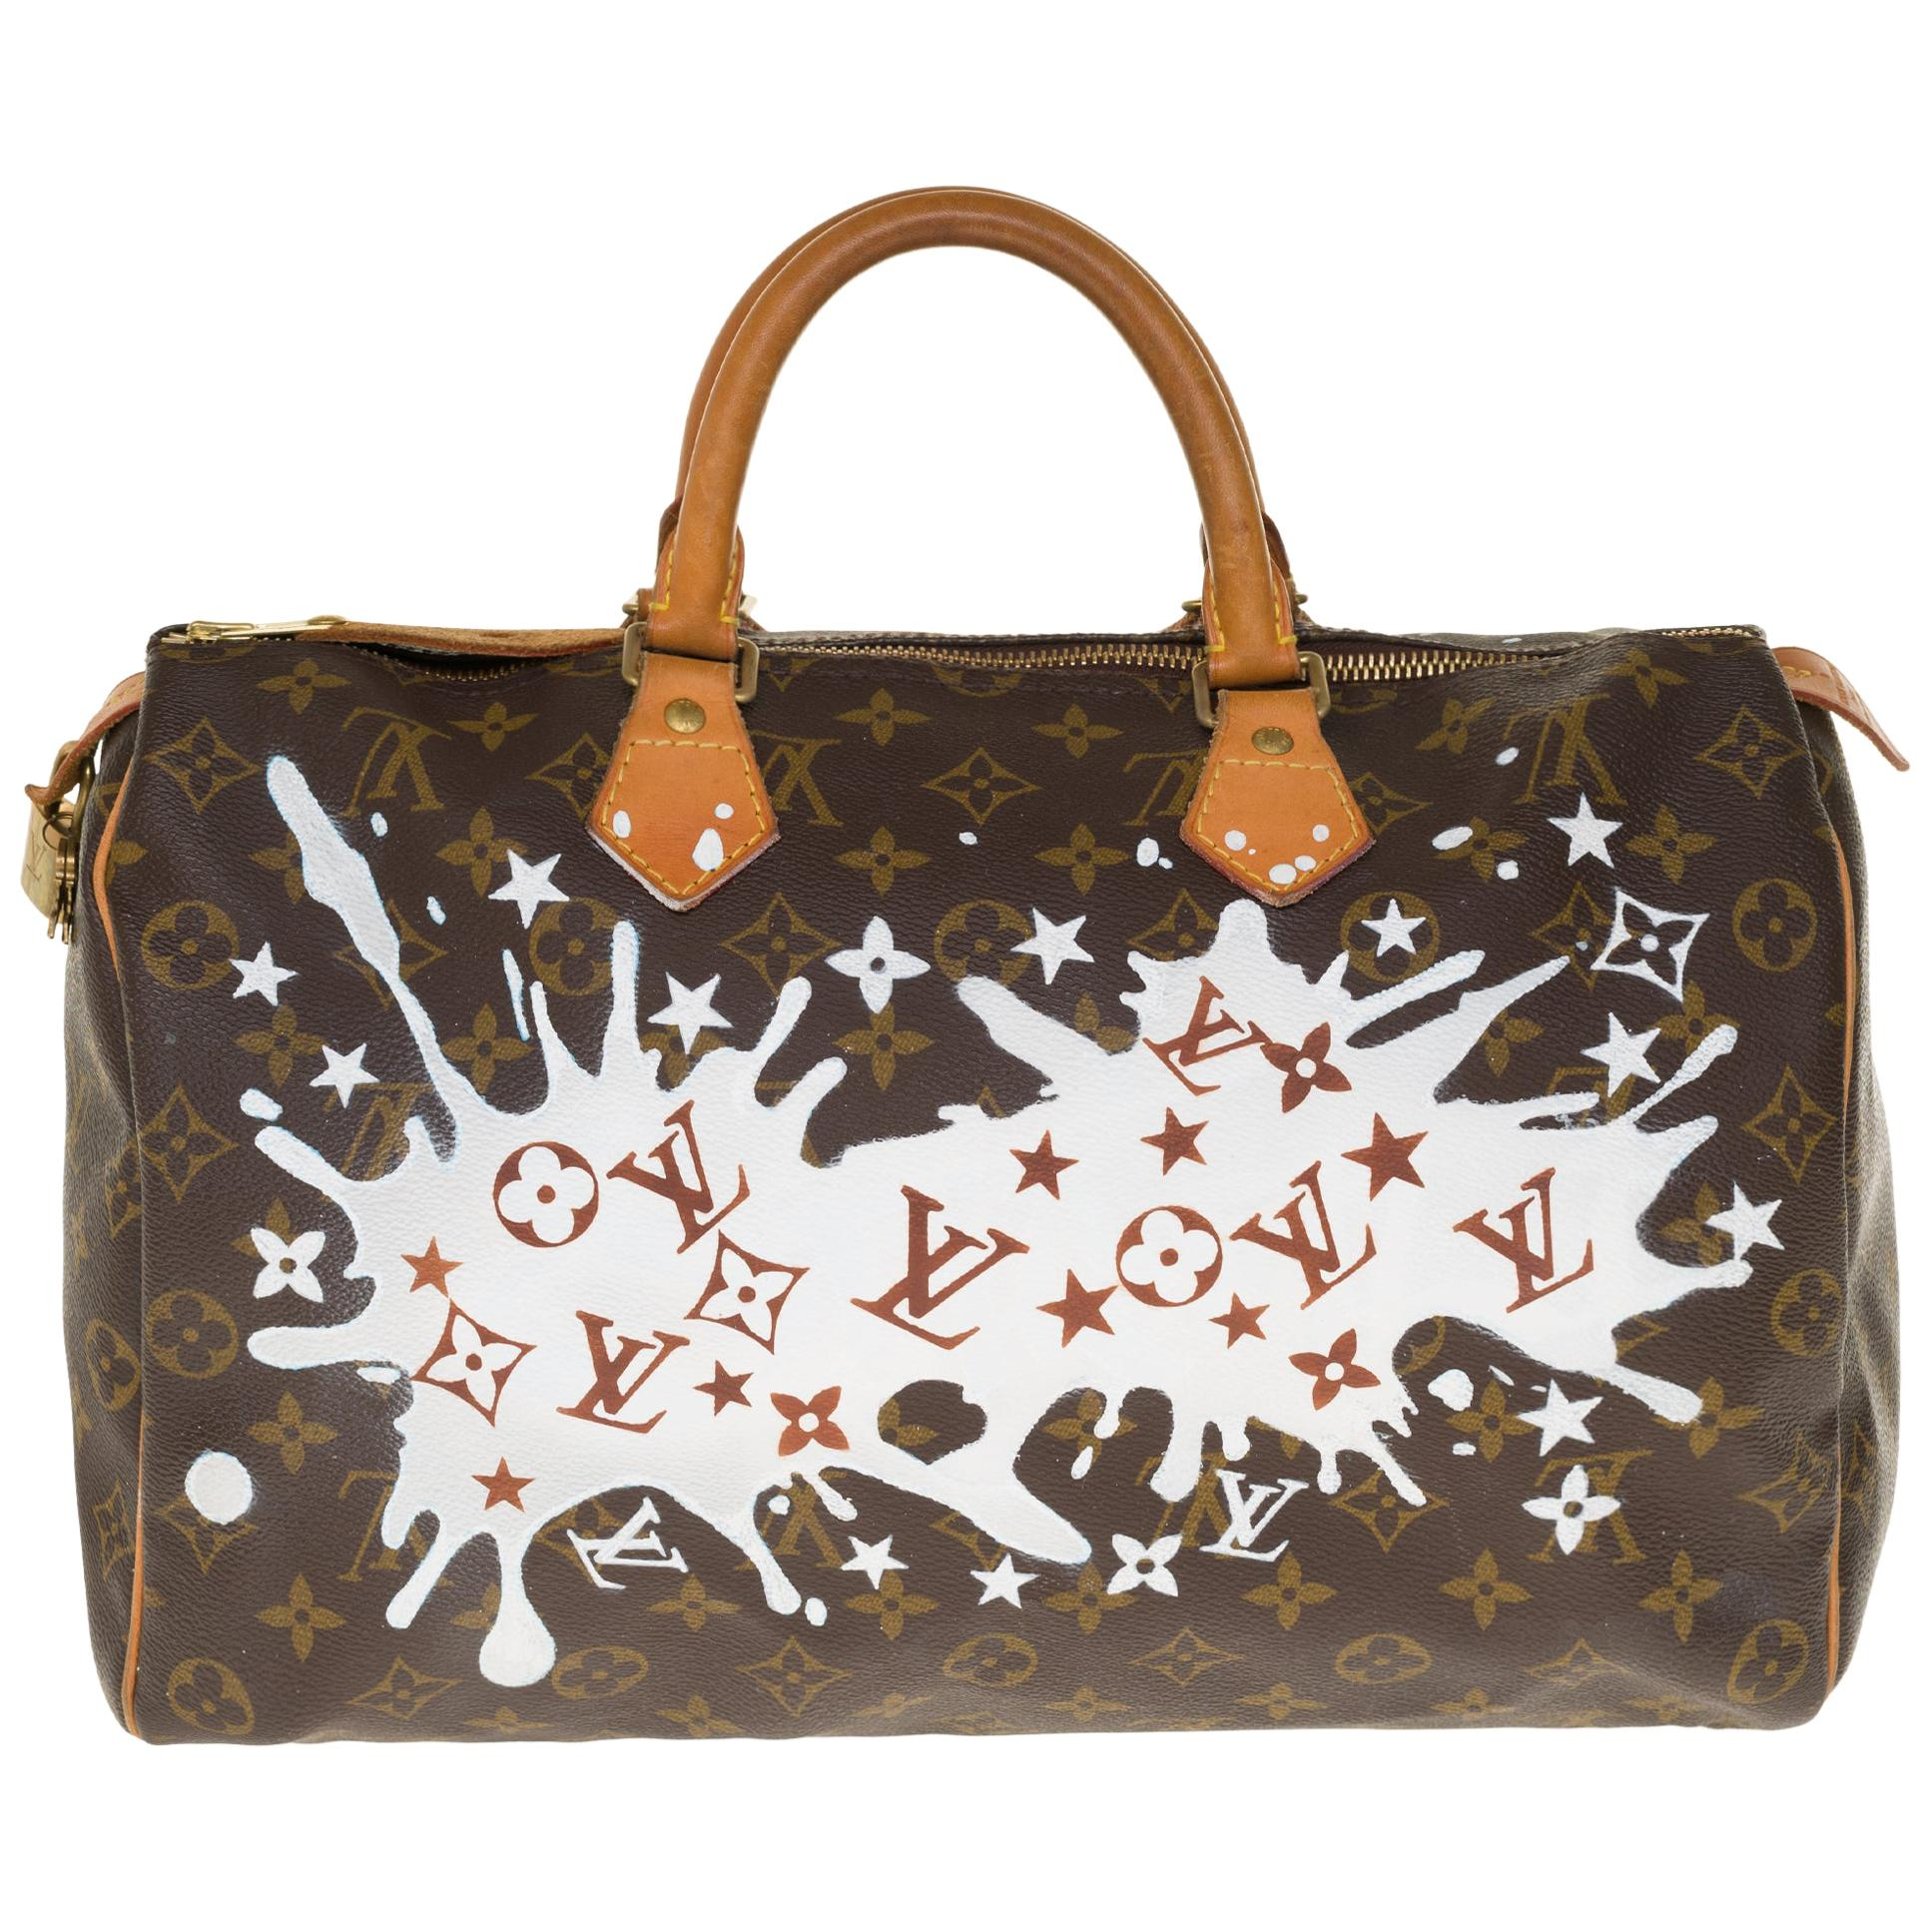 "Louis Vuitton Speedy 35 handbag in Monogram canvas customized ""Fancy"" by PatBo"